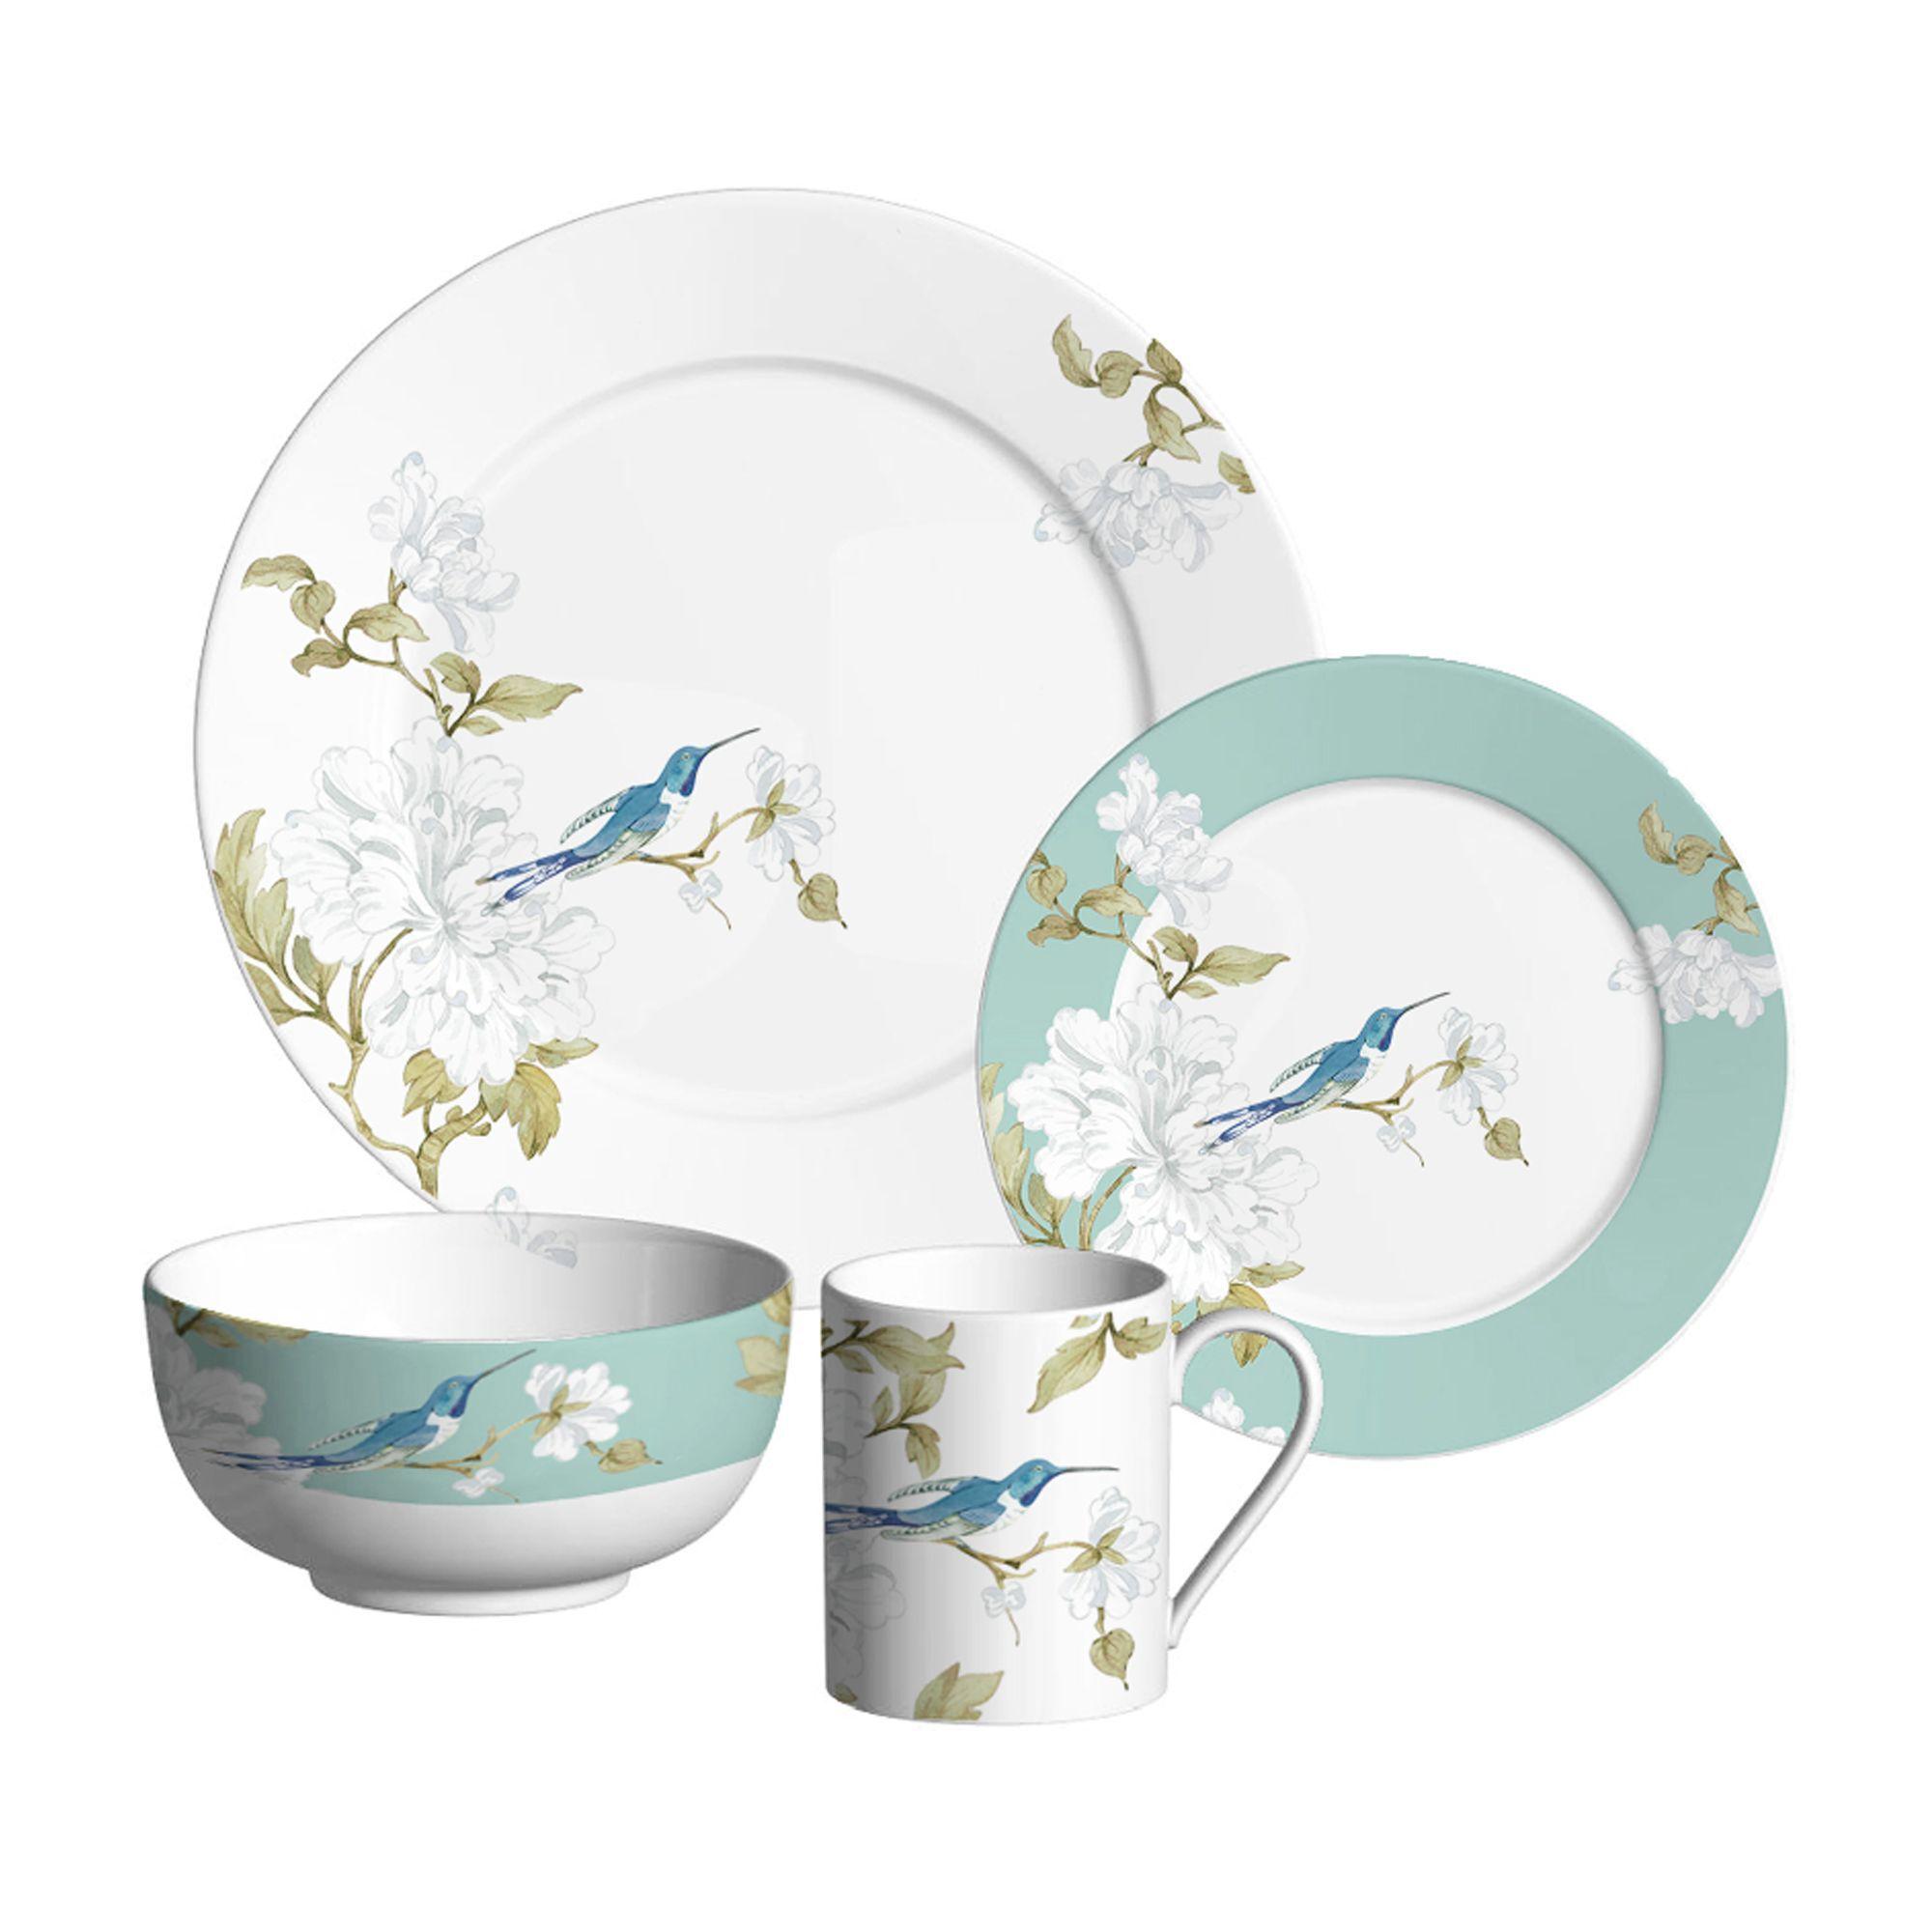 Royal Worcester U0026quot;Nectaru0026quot; Porcelain Dinnerware, ...